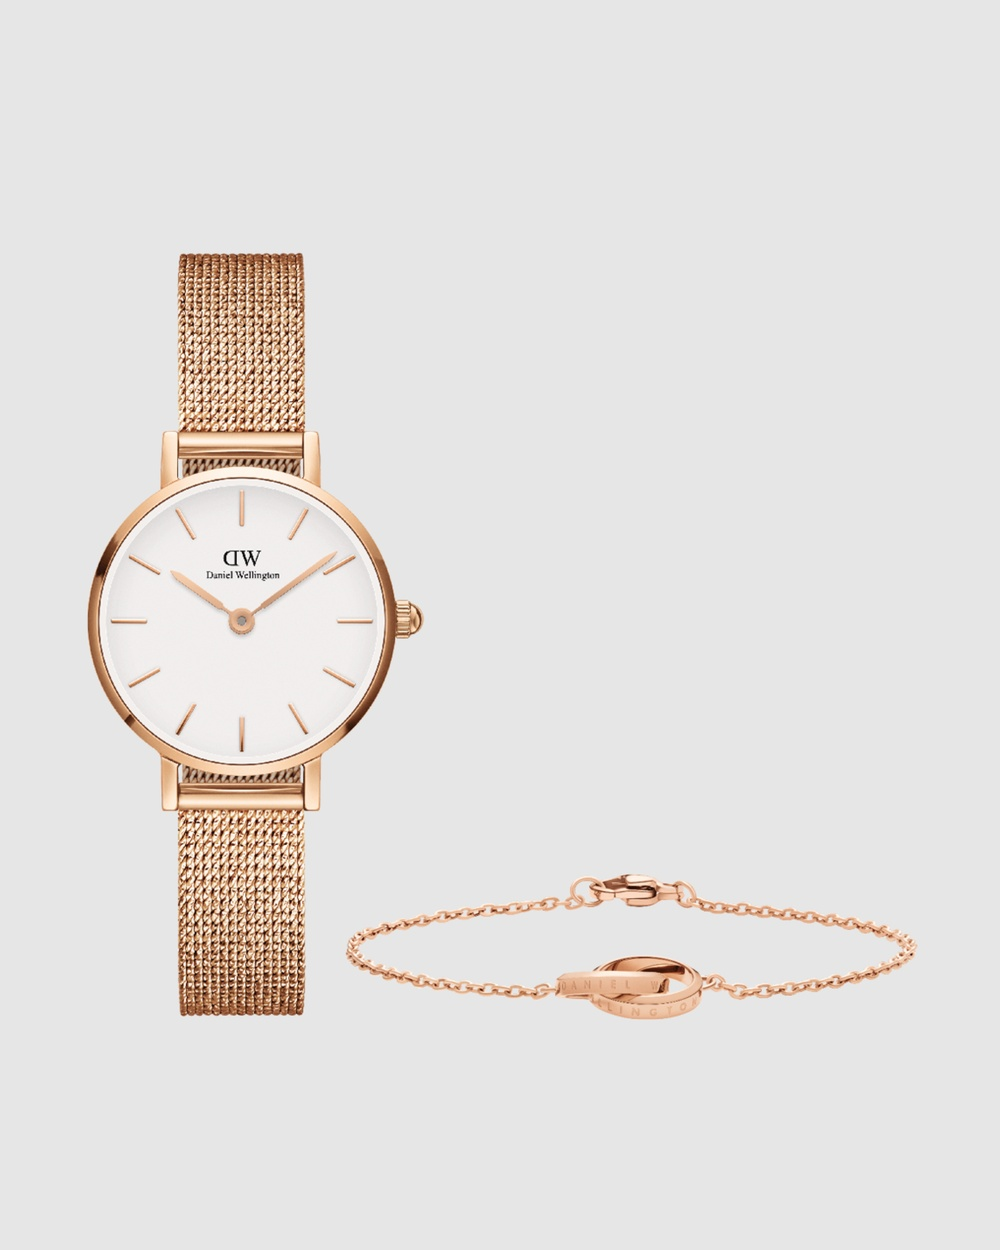 Daniel Wellington Petite Pressed Melrose + Unity Bracelet Gift Set Watches Rose gold